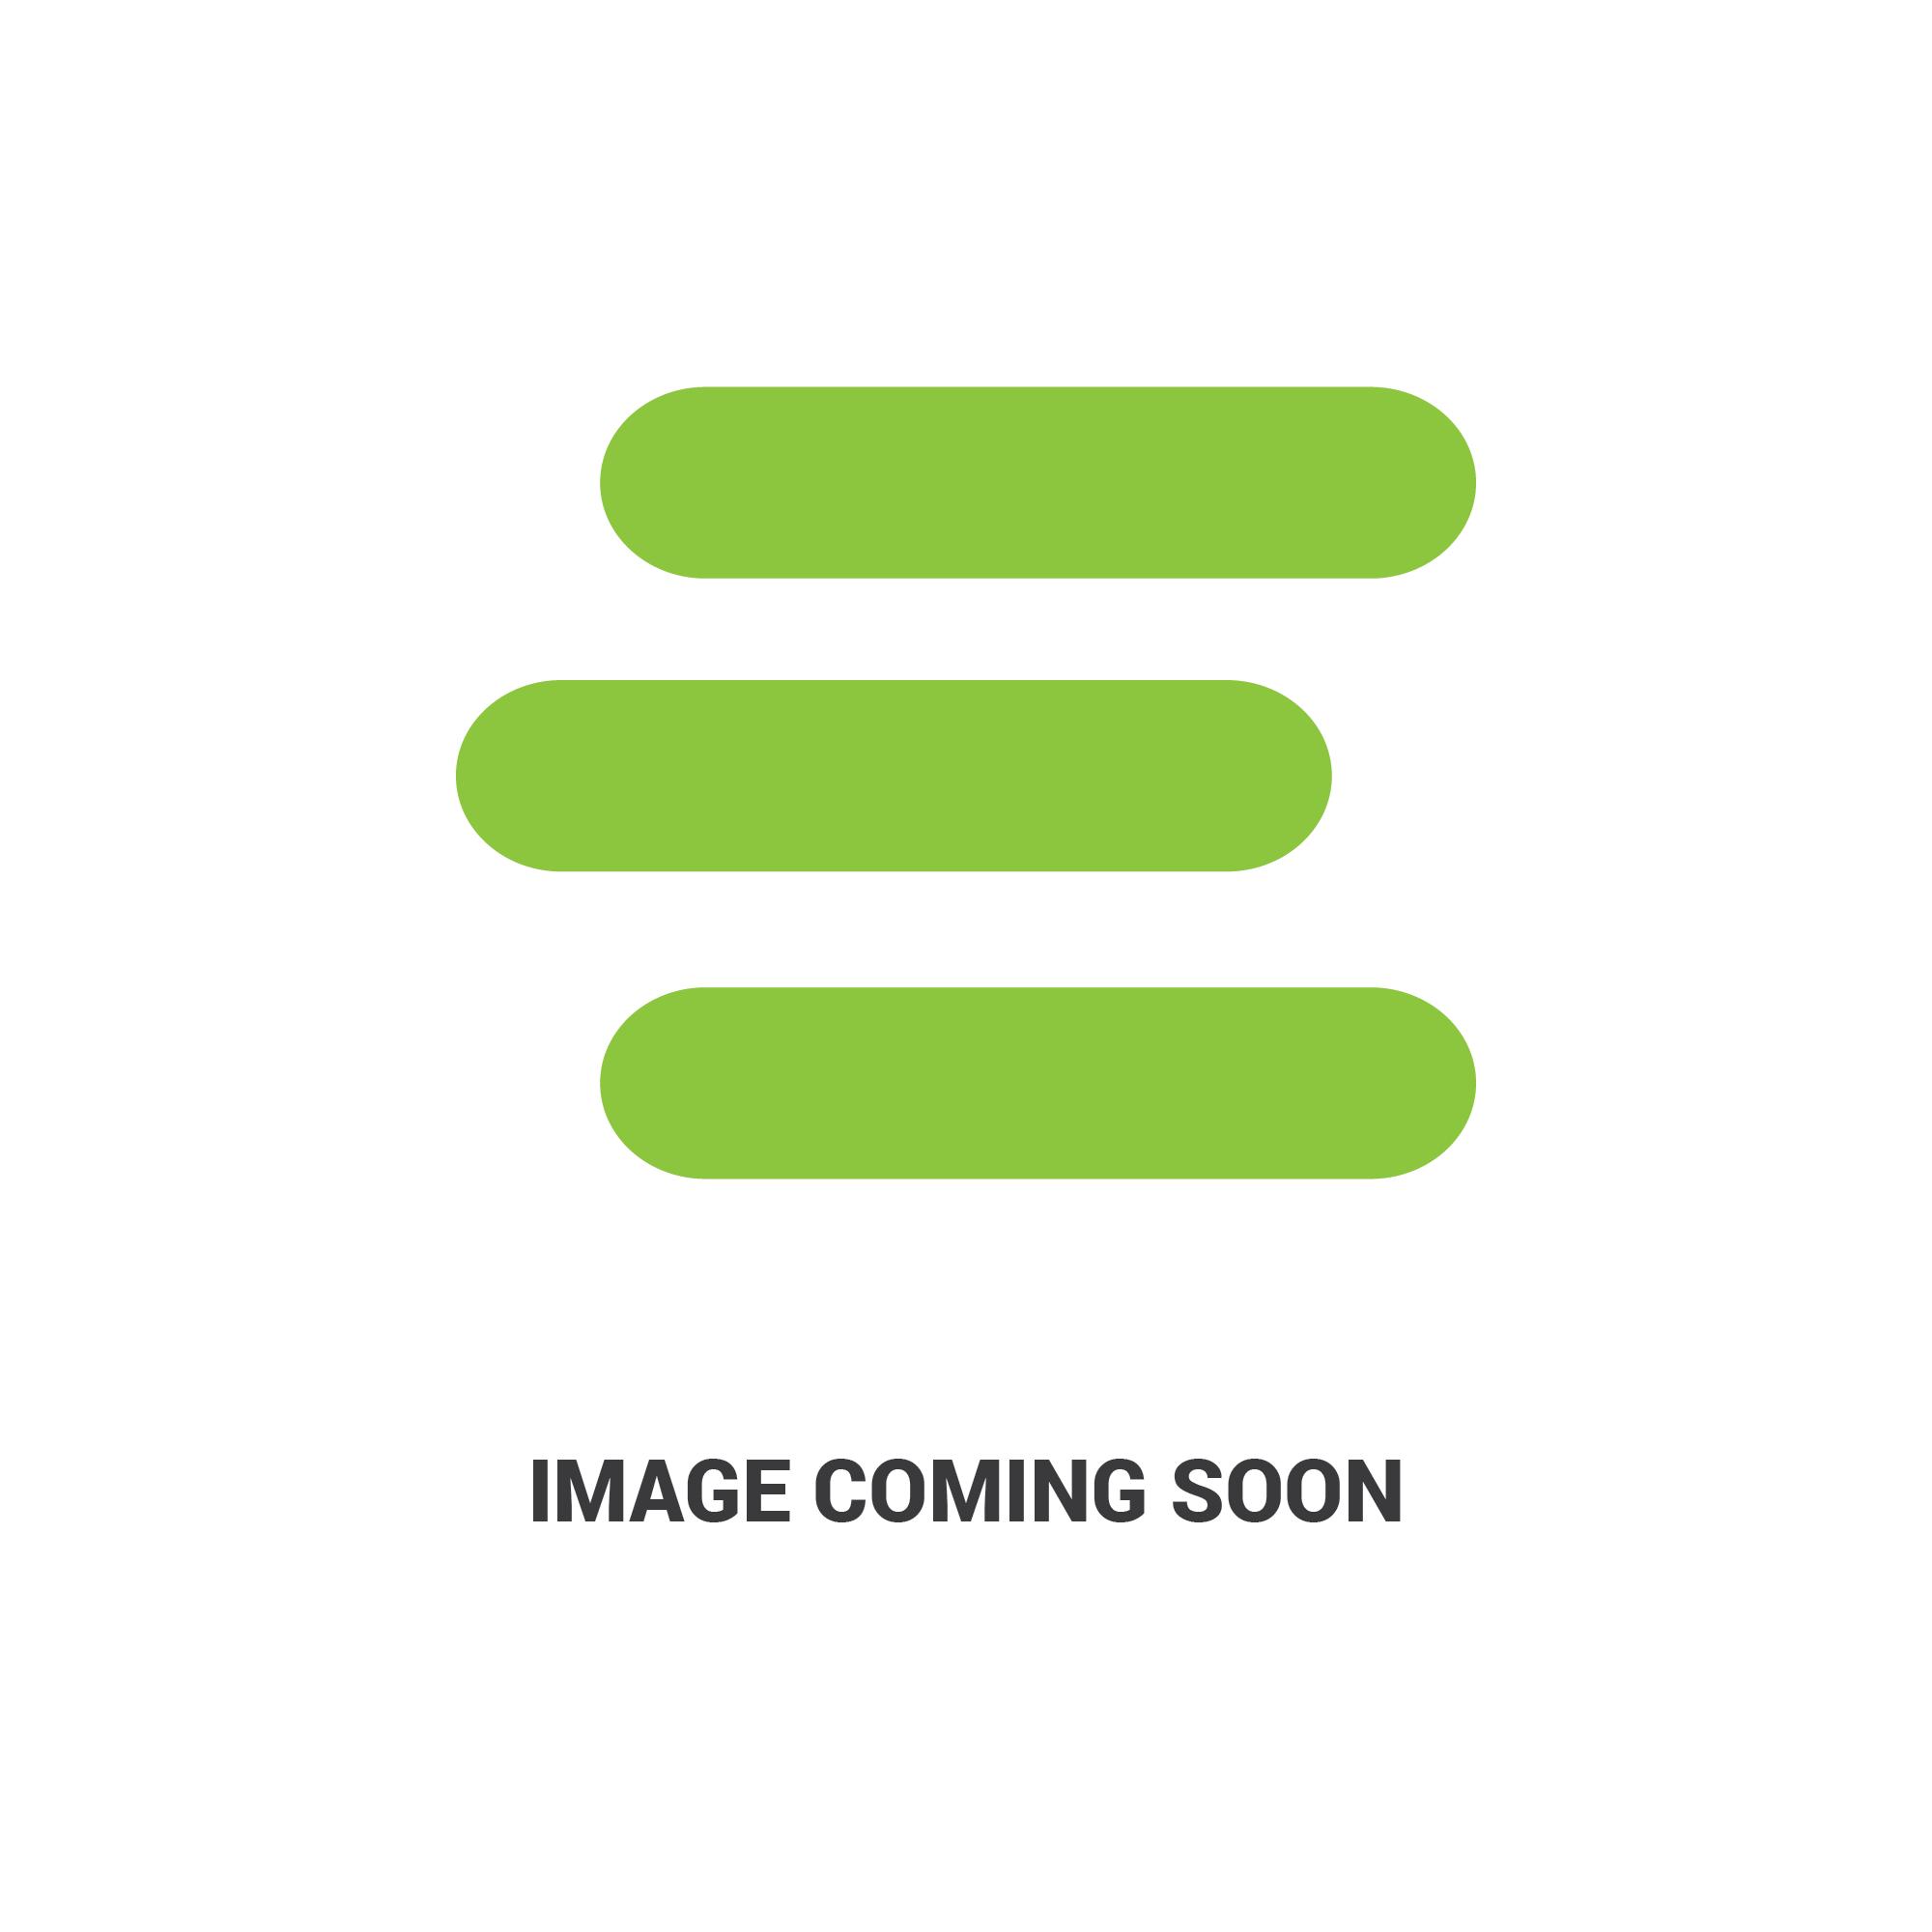 E-15241-320931968_1.jpg